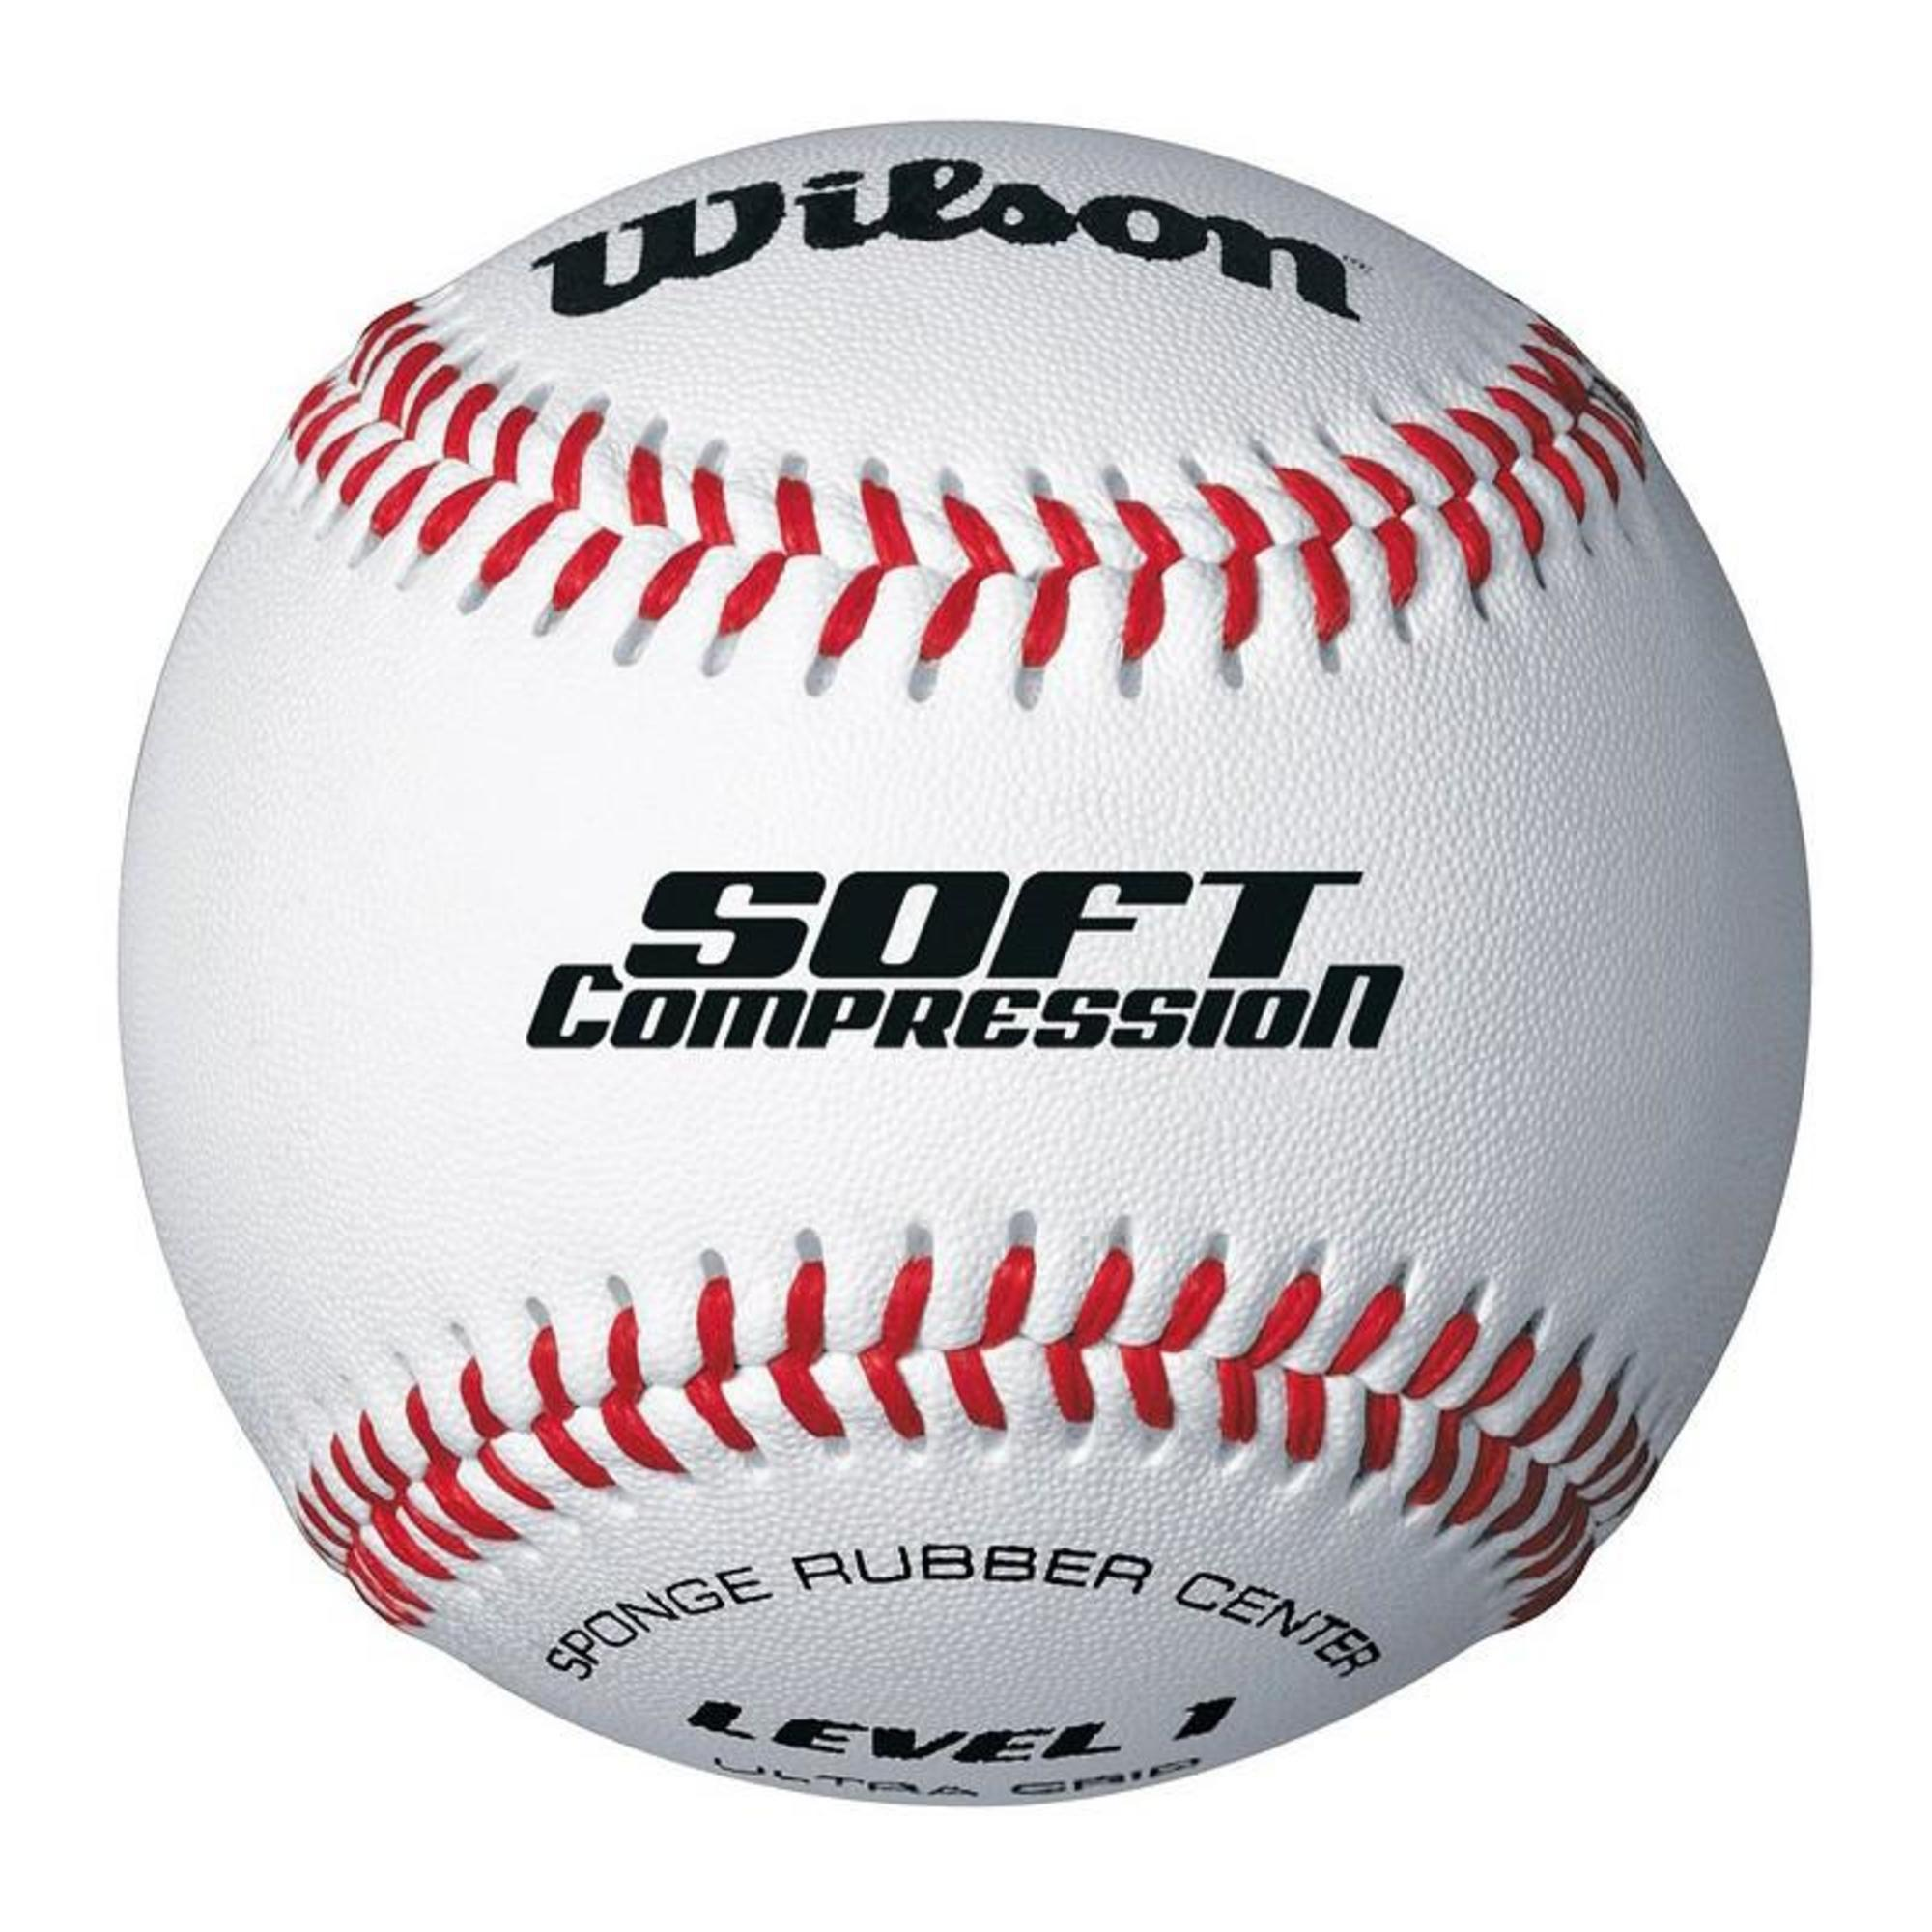 Comprar Pelotas y Bates de Beísbol y Softball  2249708b52e0c